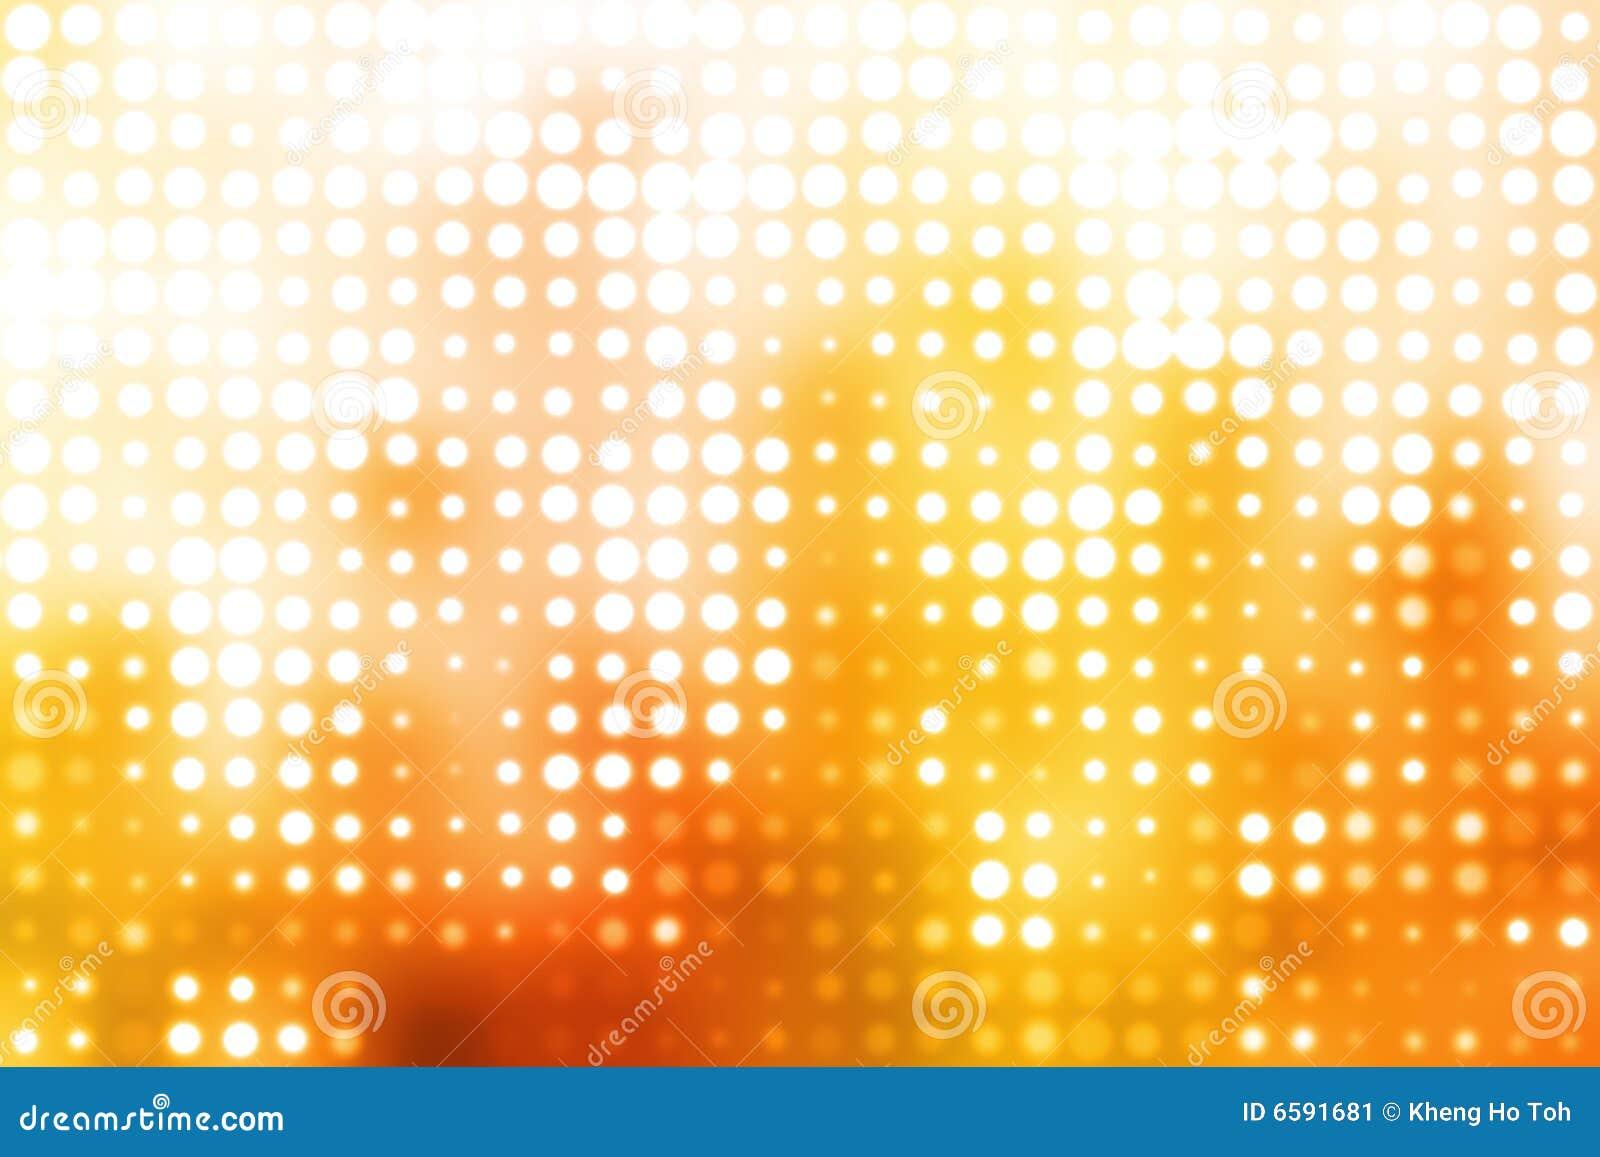 Orange And White Glowing Futuristic Background Stock Image